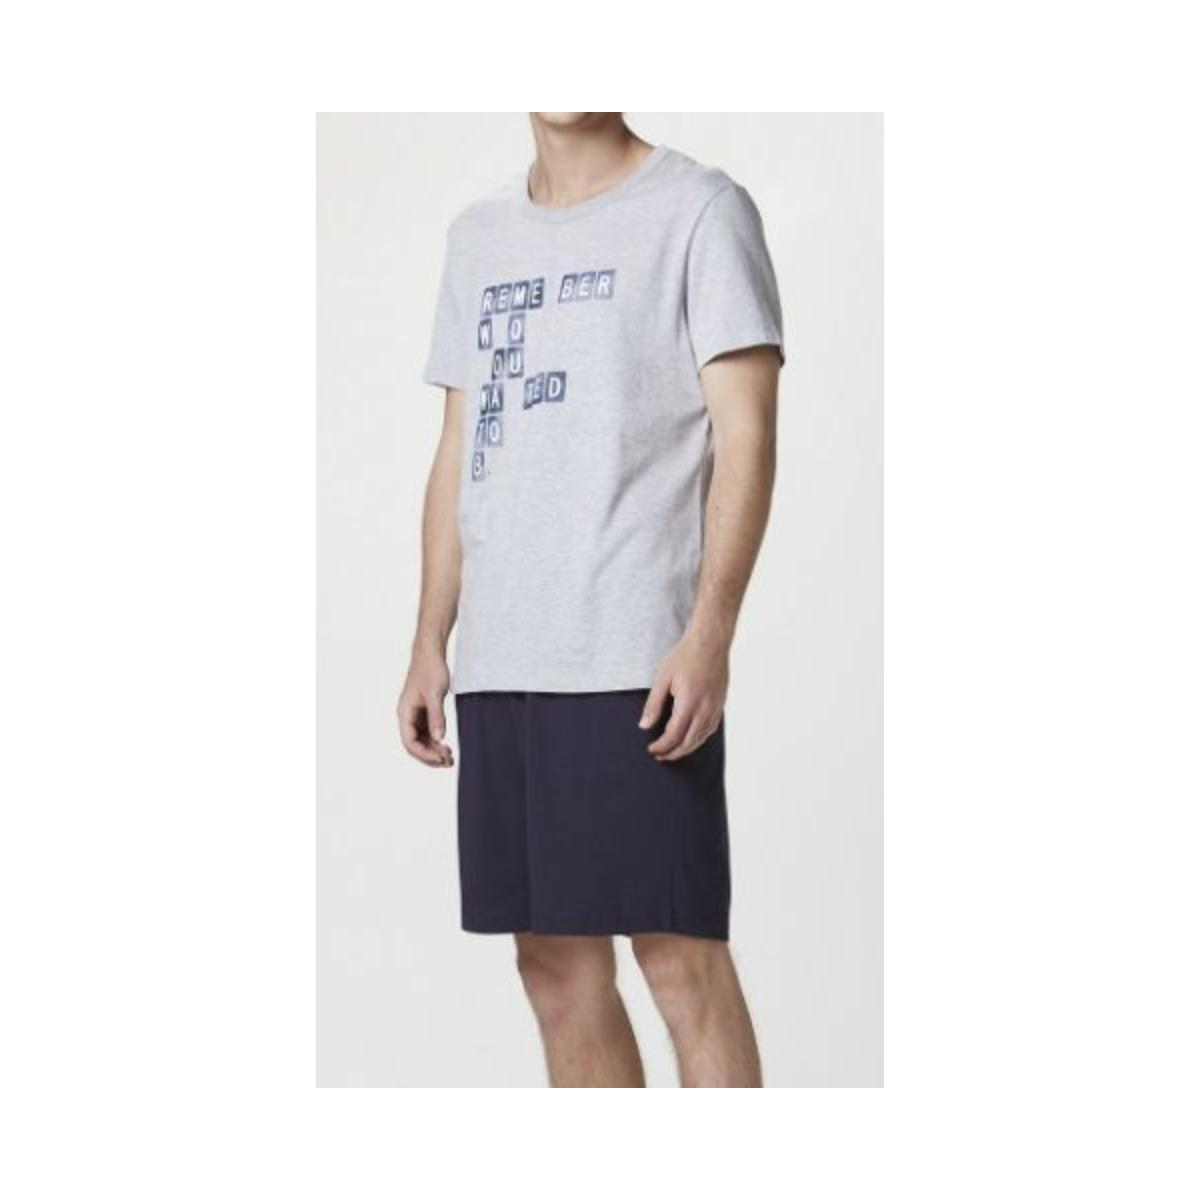 Pijama Masculina Hering 7bzk 1den Mescla/marinho